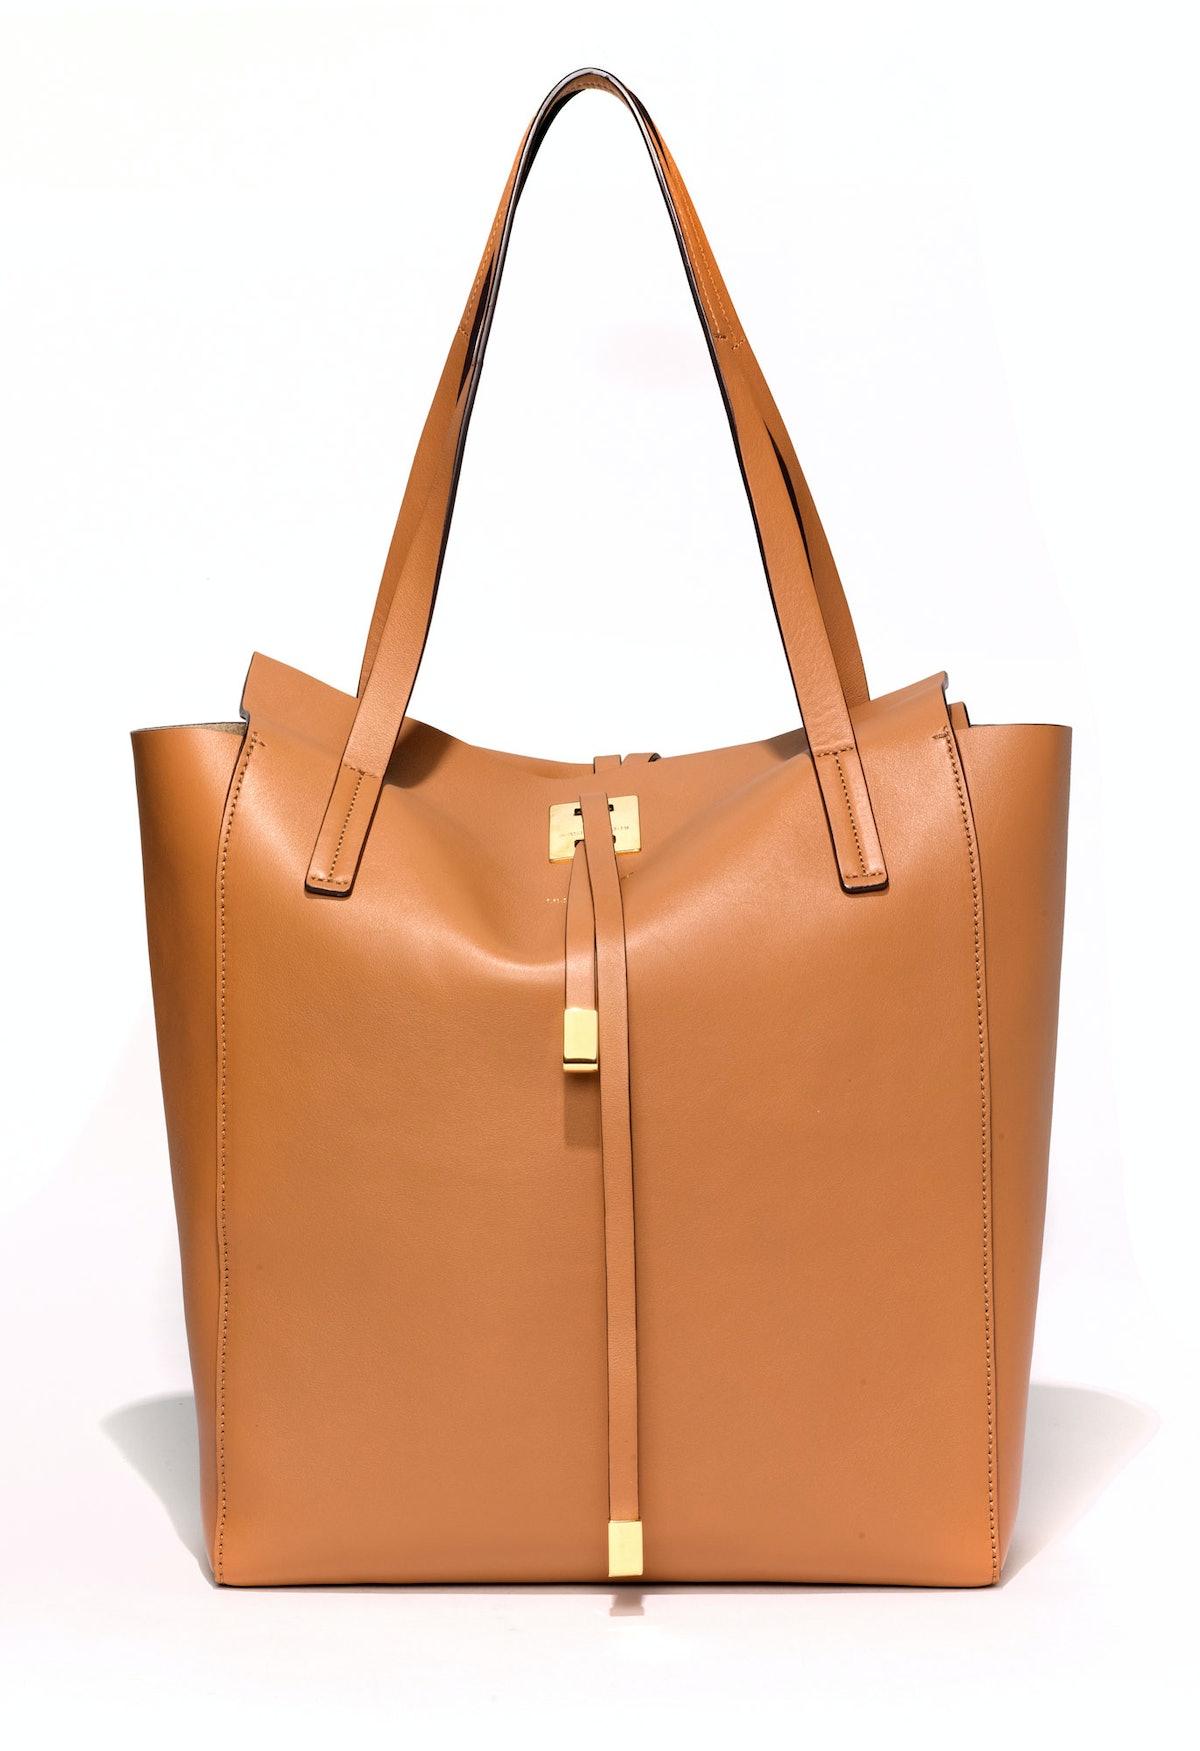 Michael Kors tote bag, $995, select Michael Kors stores, 866.709.KORS.